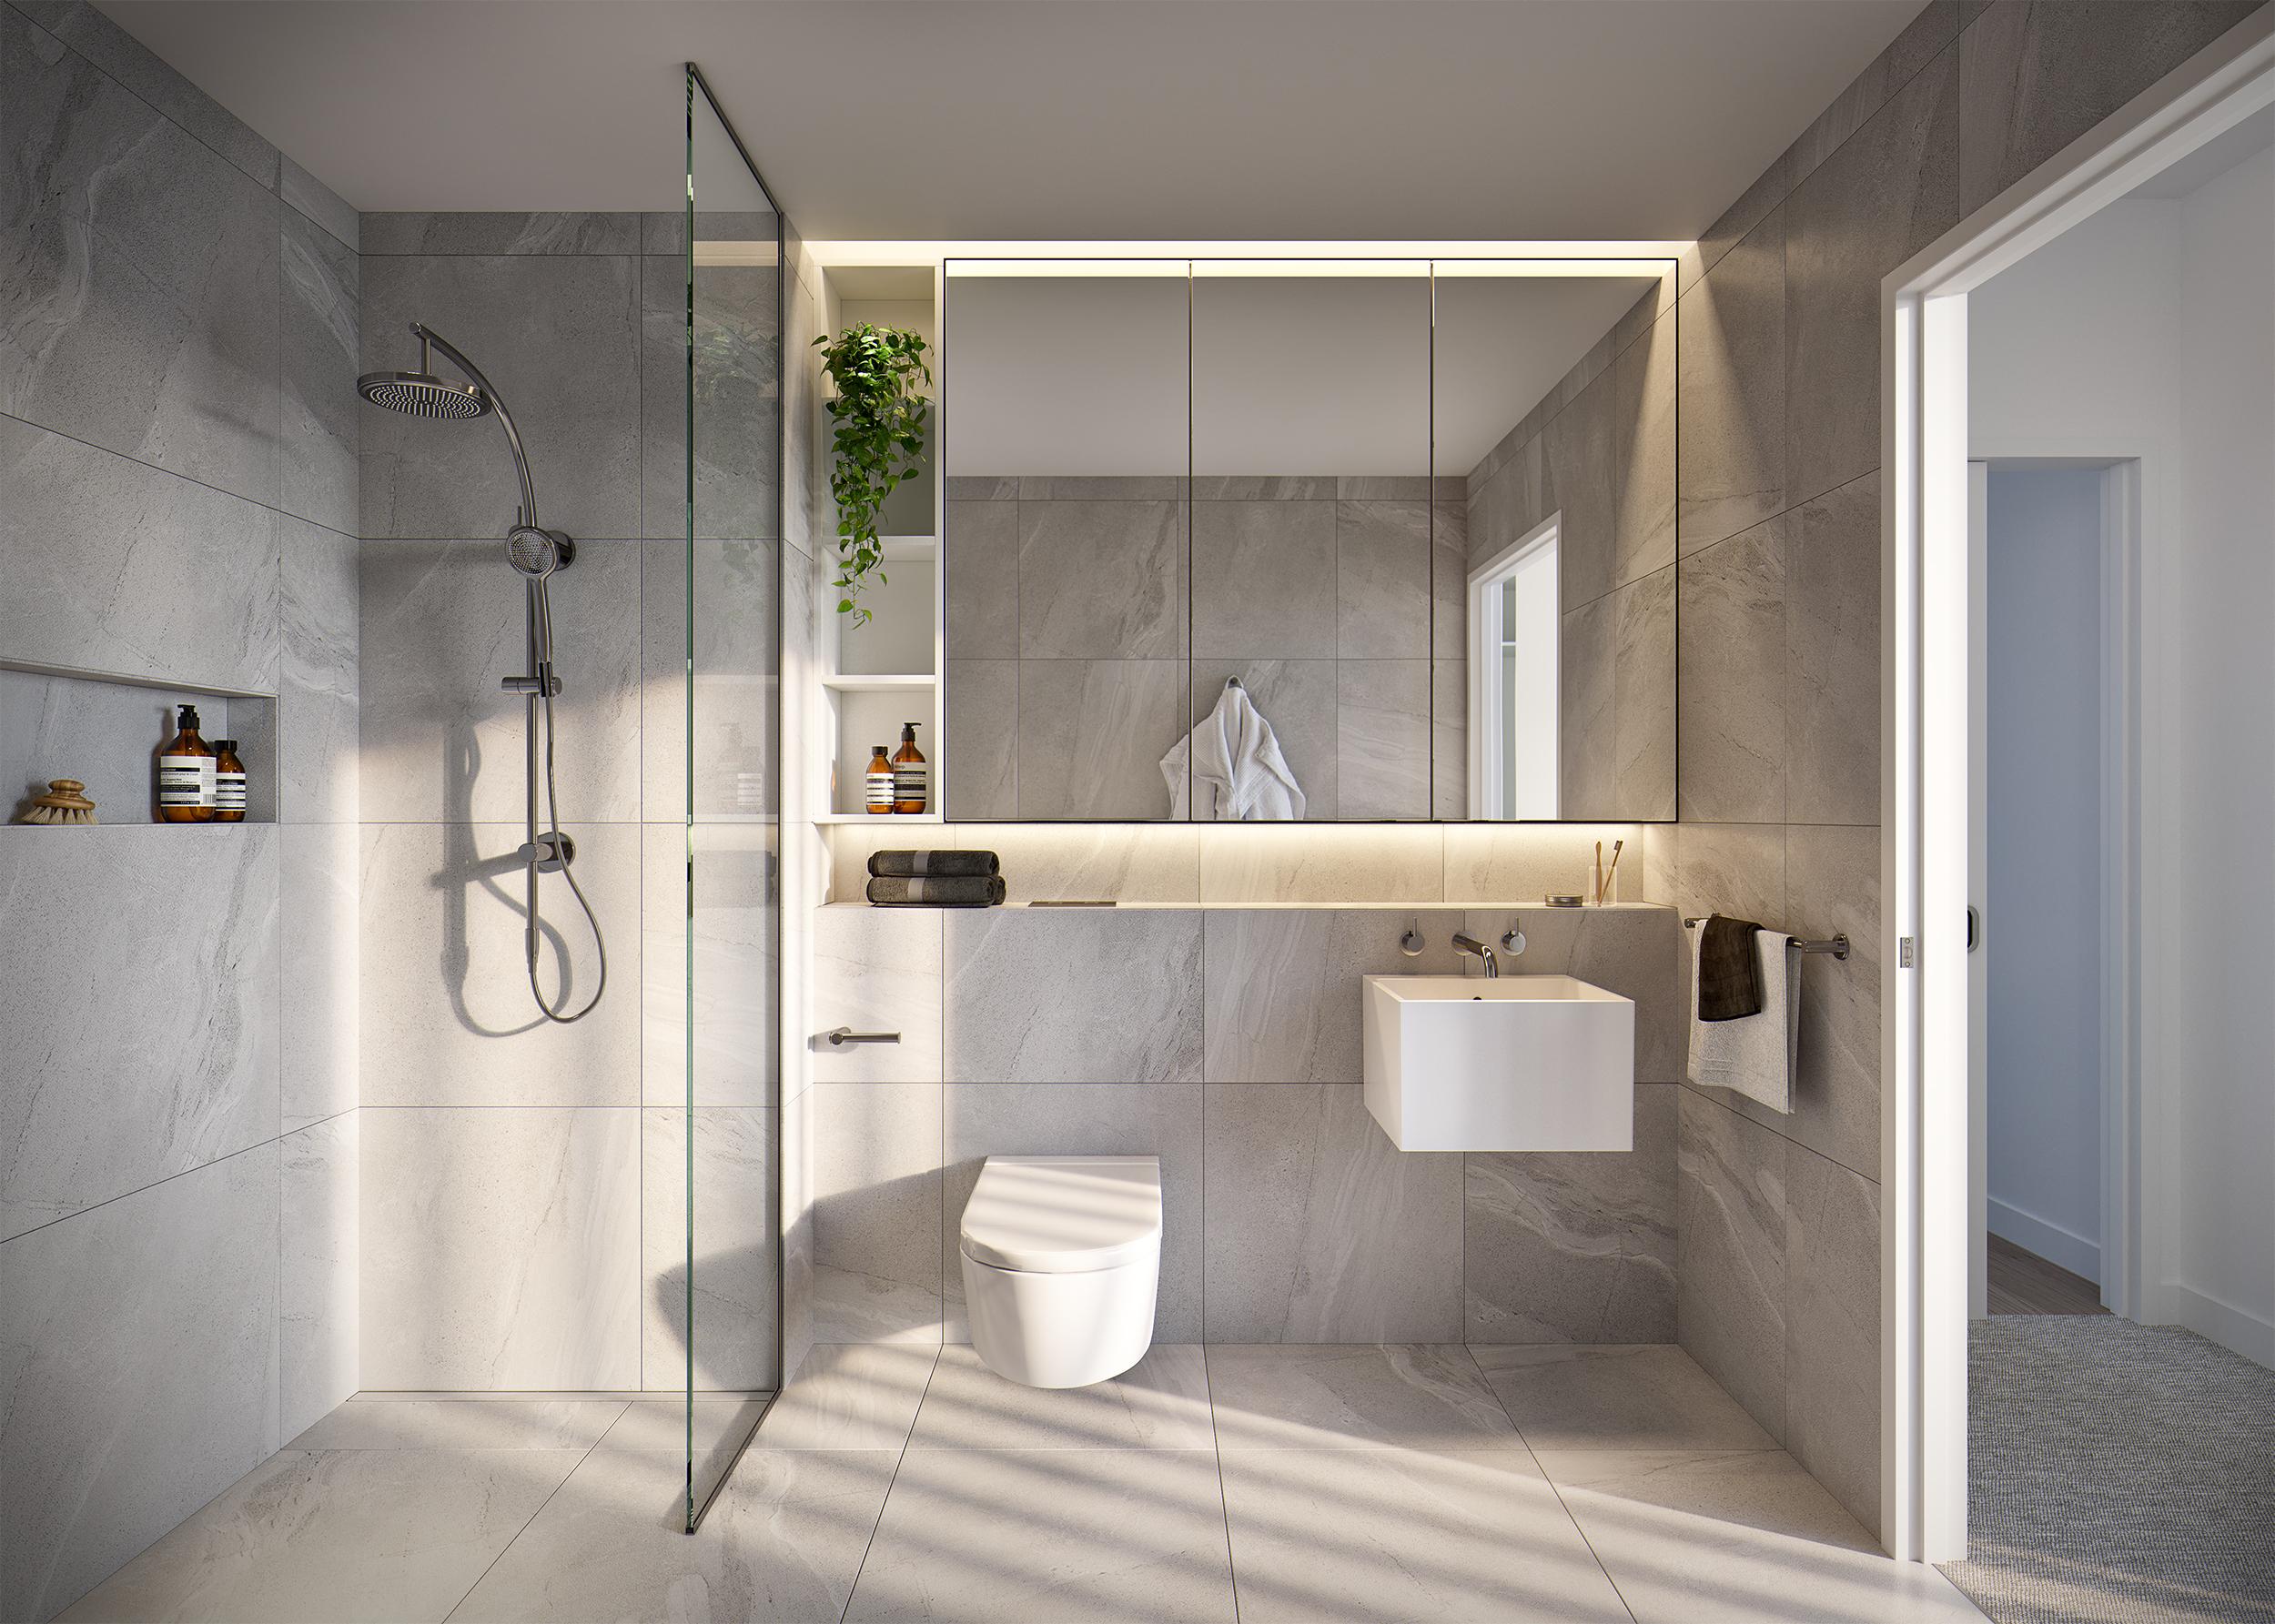 Horizon apartment bathroom